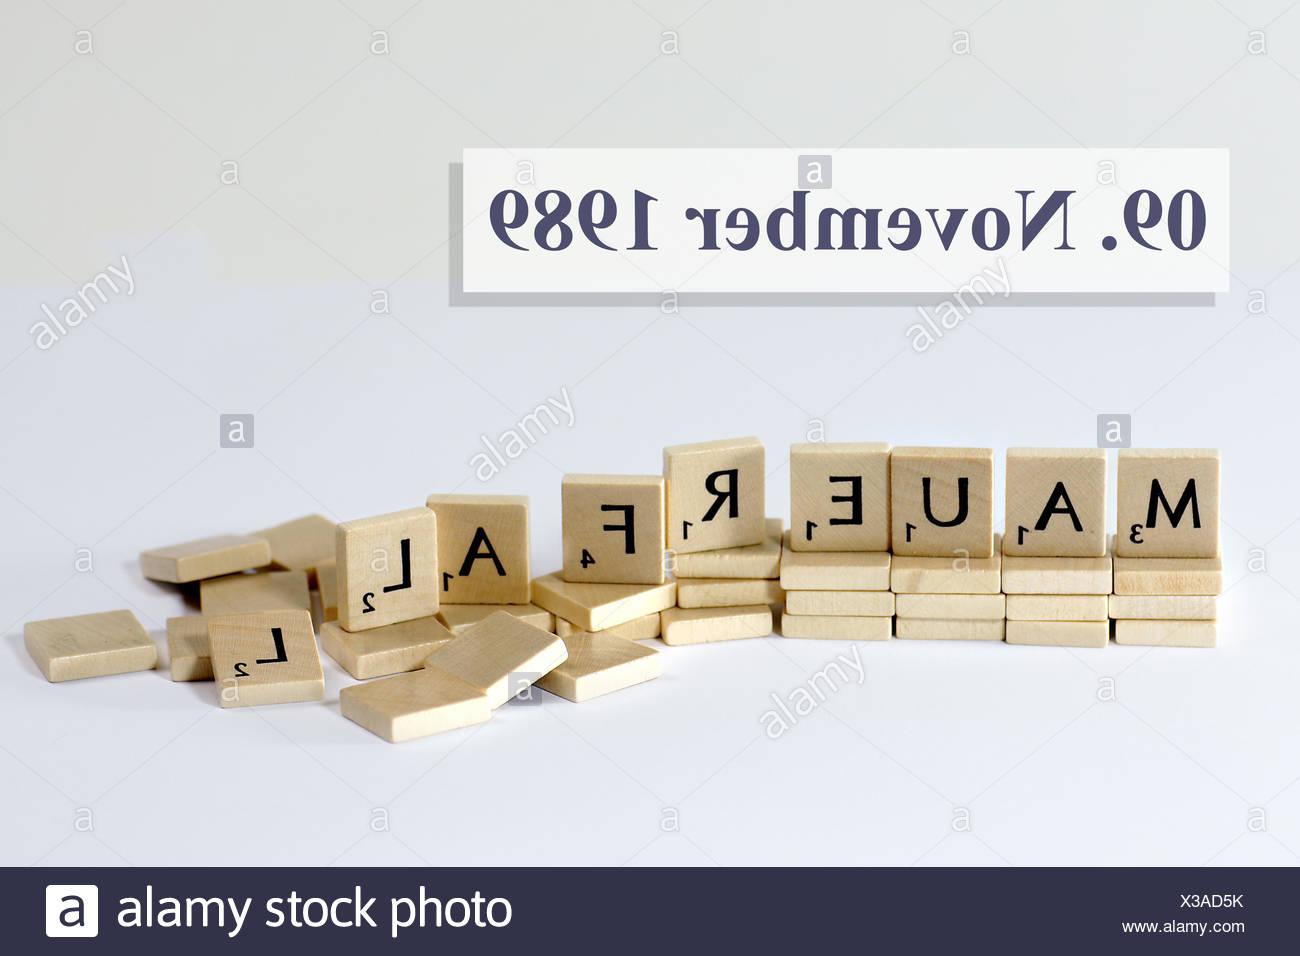 politics - Stock Image